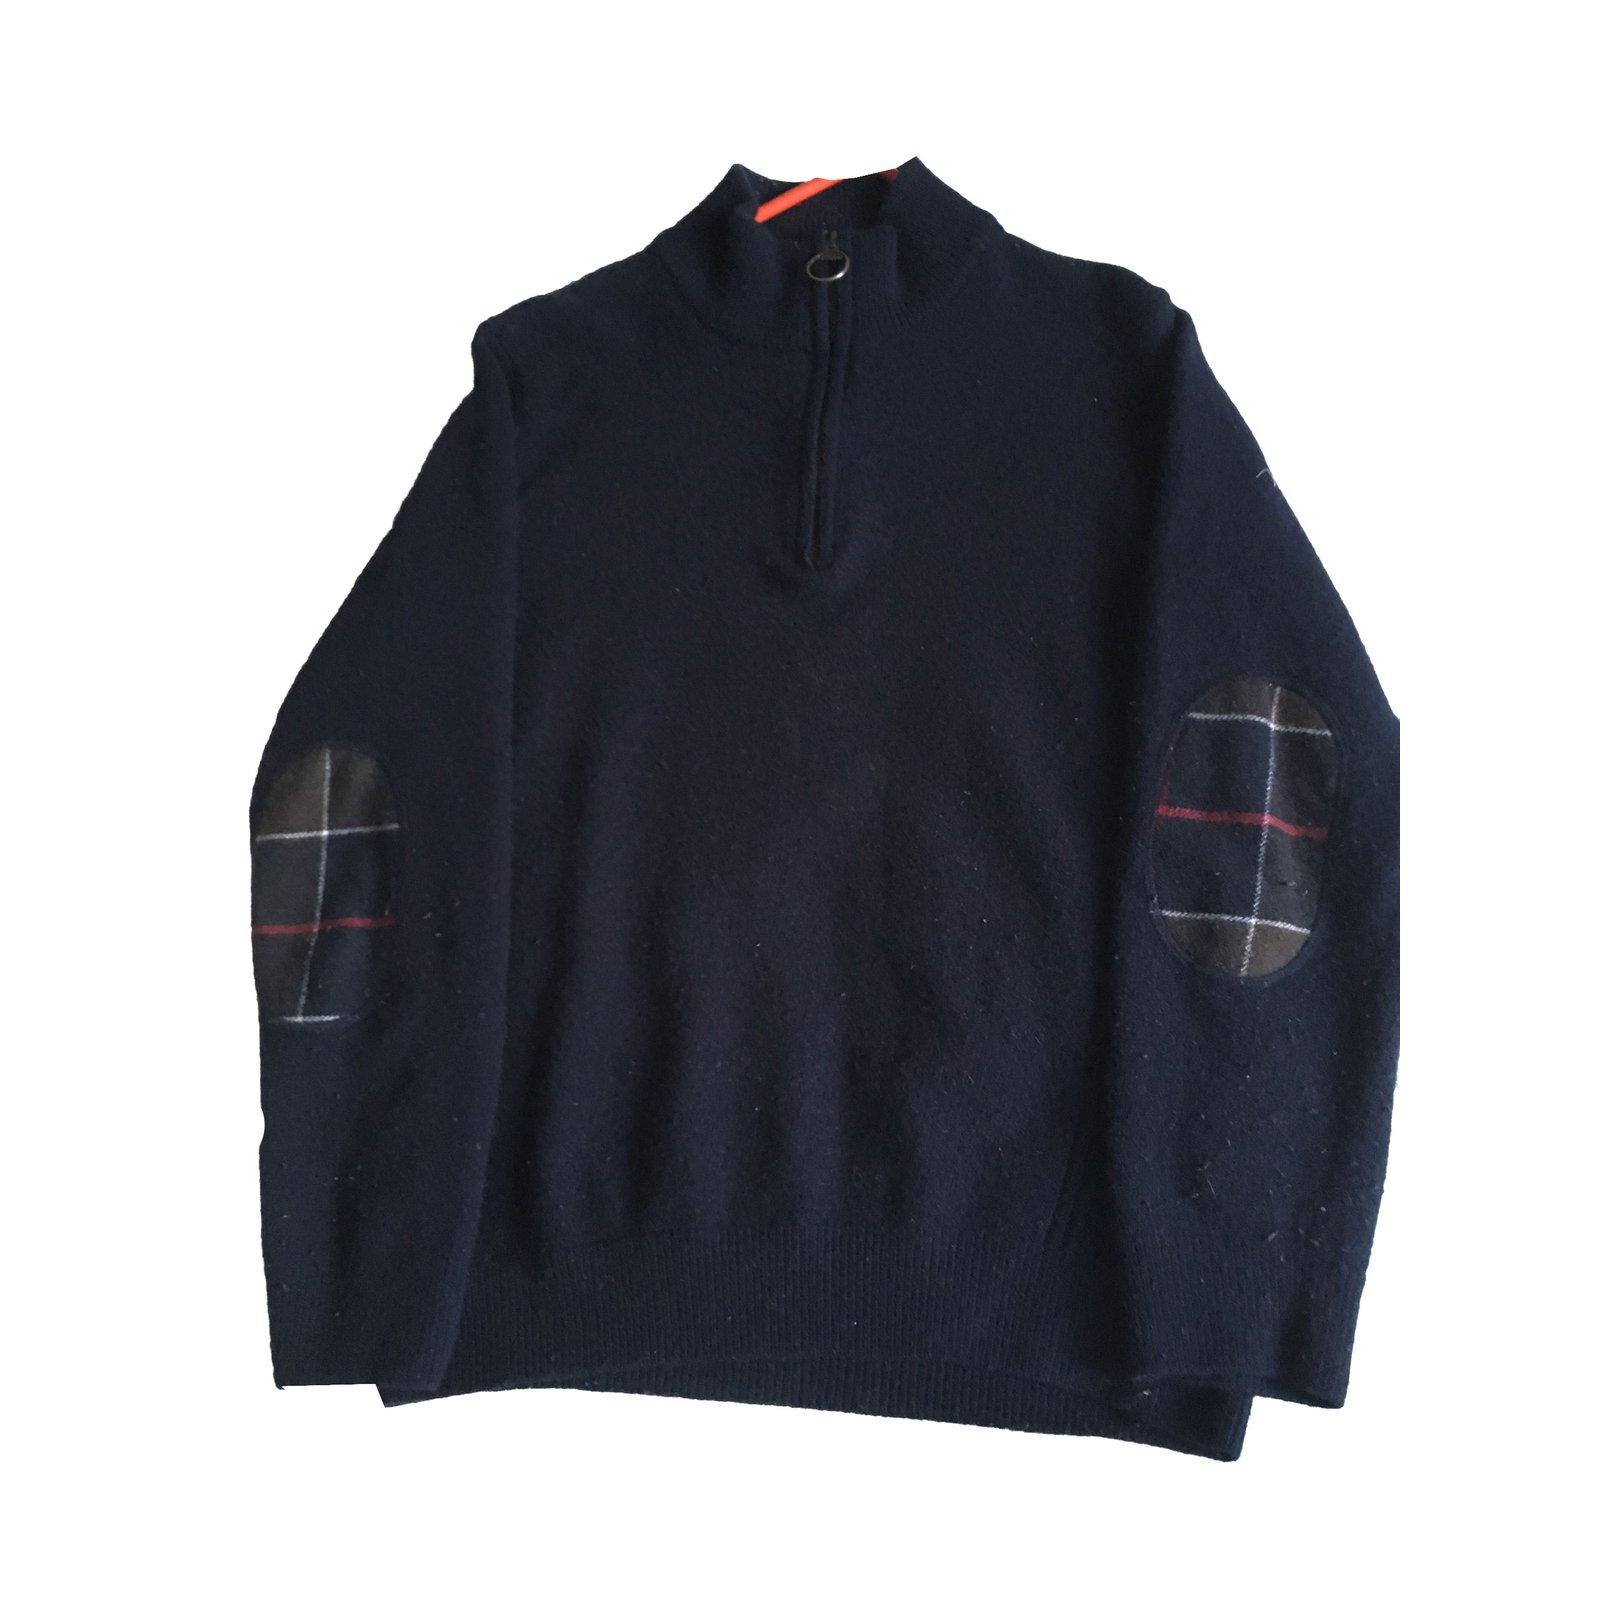 annorlunda till salu lägsta rabatt Barbour Sweater Sweaters Wool Navy blue ref.86042 - Joli Closet